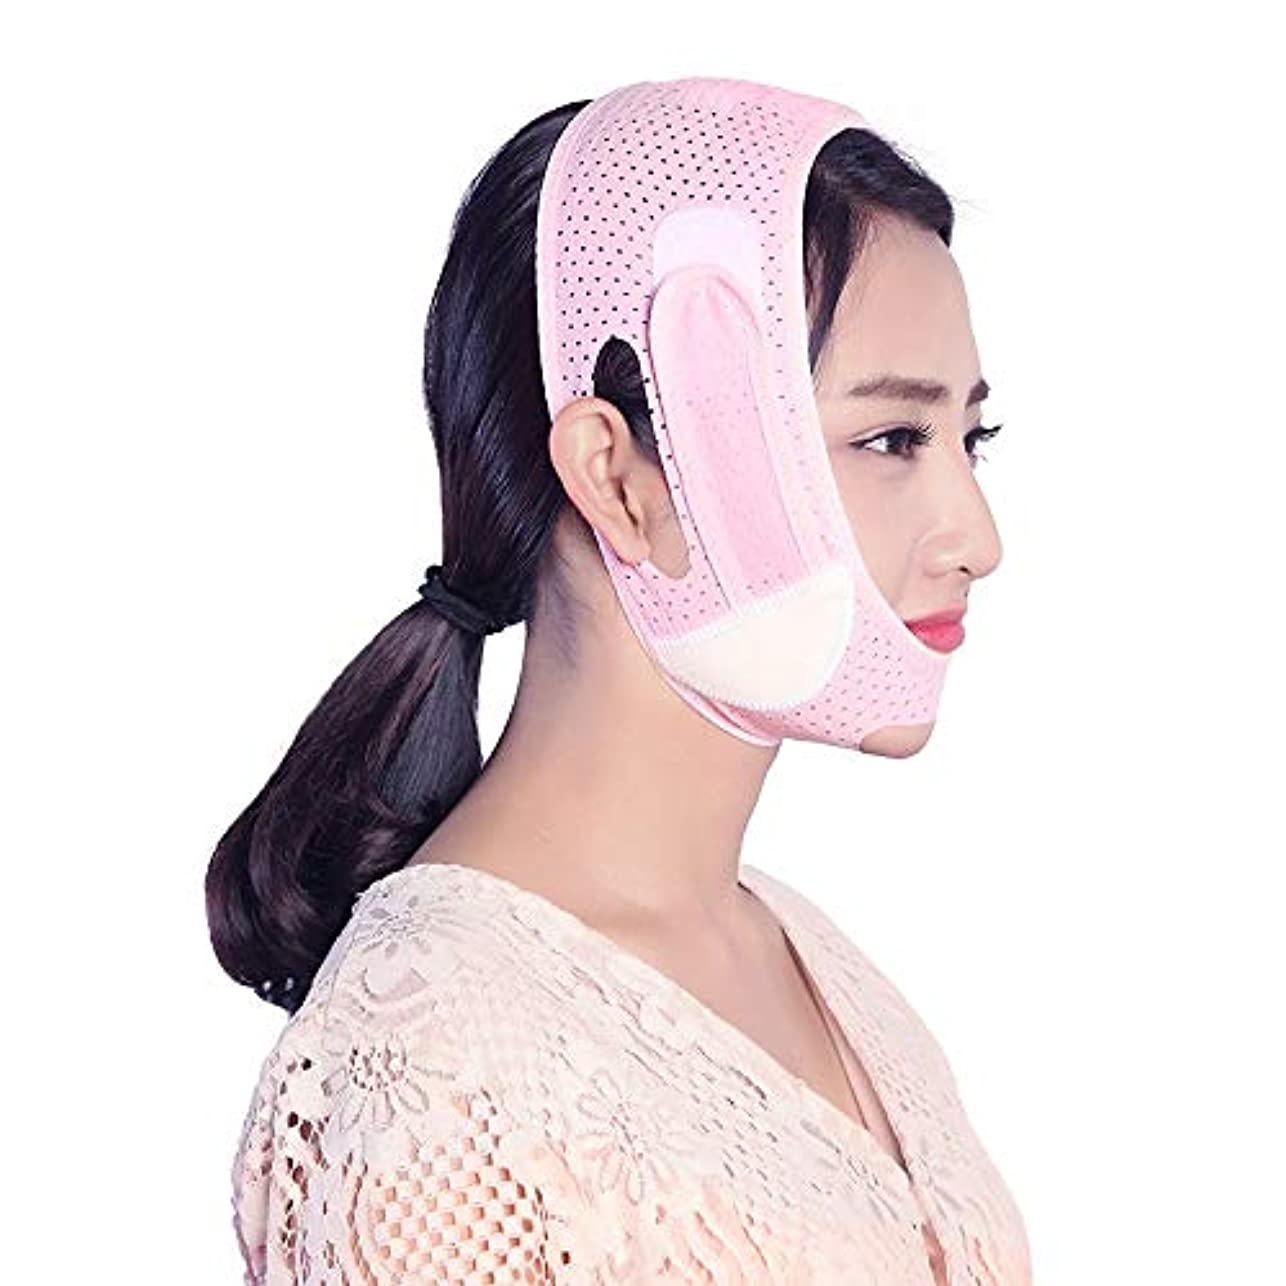 Jia Jia- 睡眠薄い顔パッチ包帯吊り上げプルv顔引き締めどころアーティファクト判決パターン二重あご薄いマッセルマスク - ピンク 顔面包帯